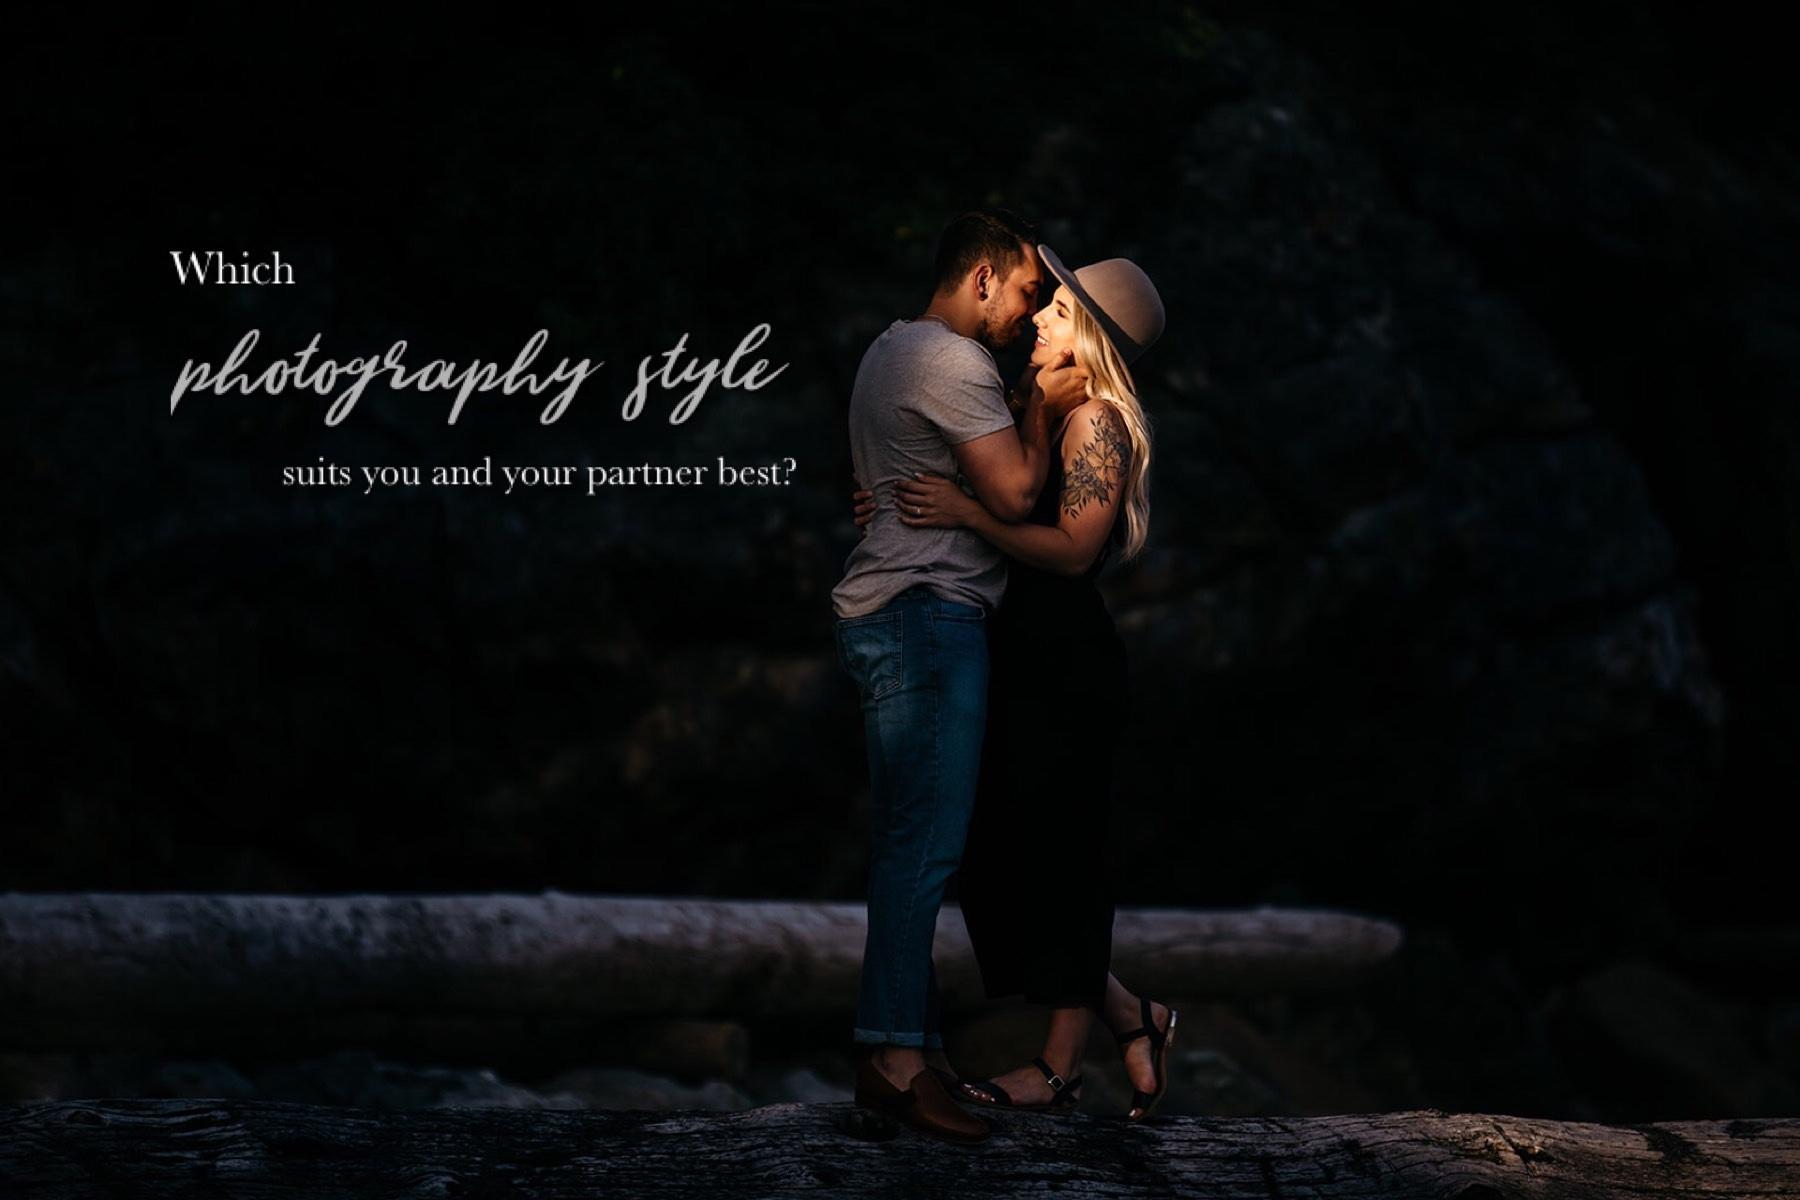 vancouver wedding photographer videographer.jpg